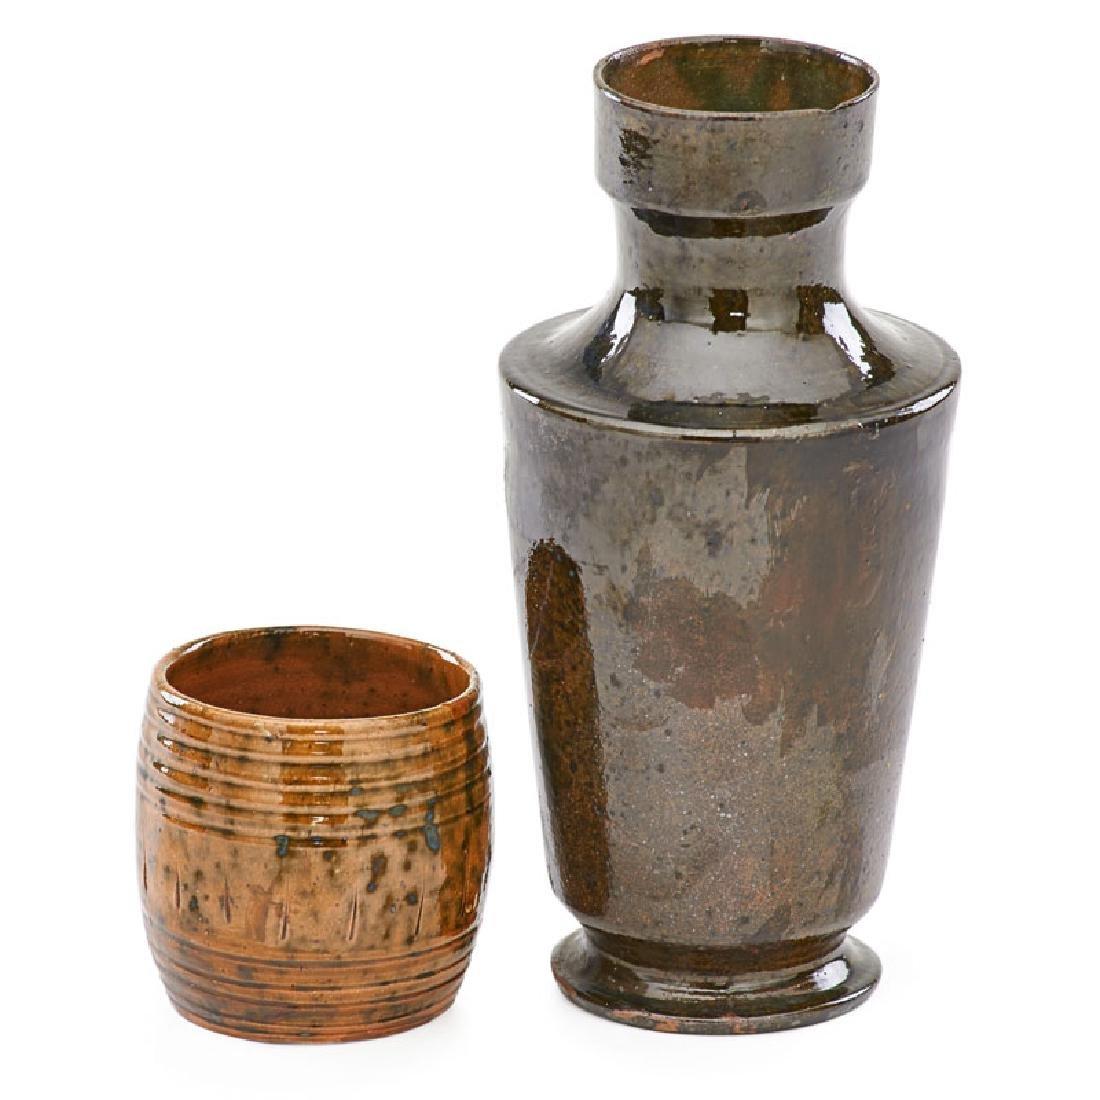 GEORGE OHR Novelty and vase